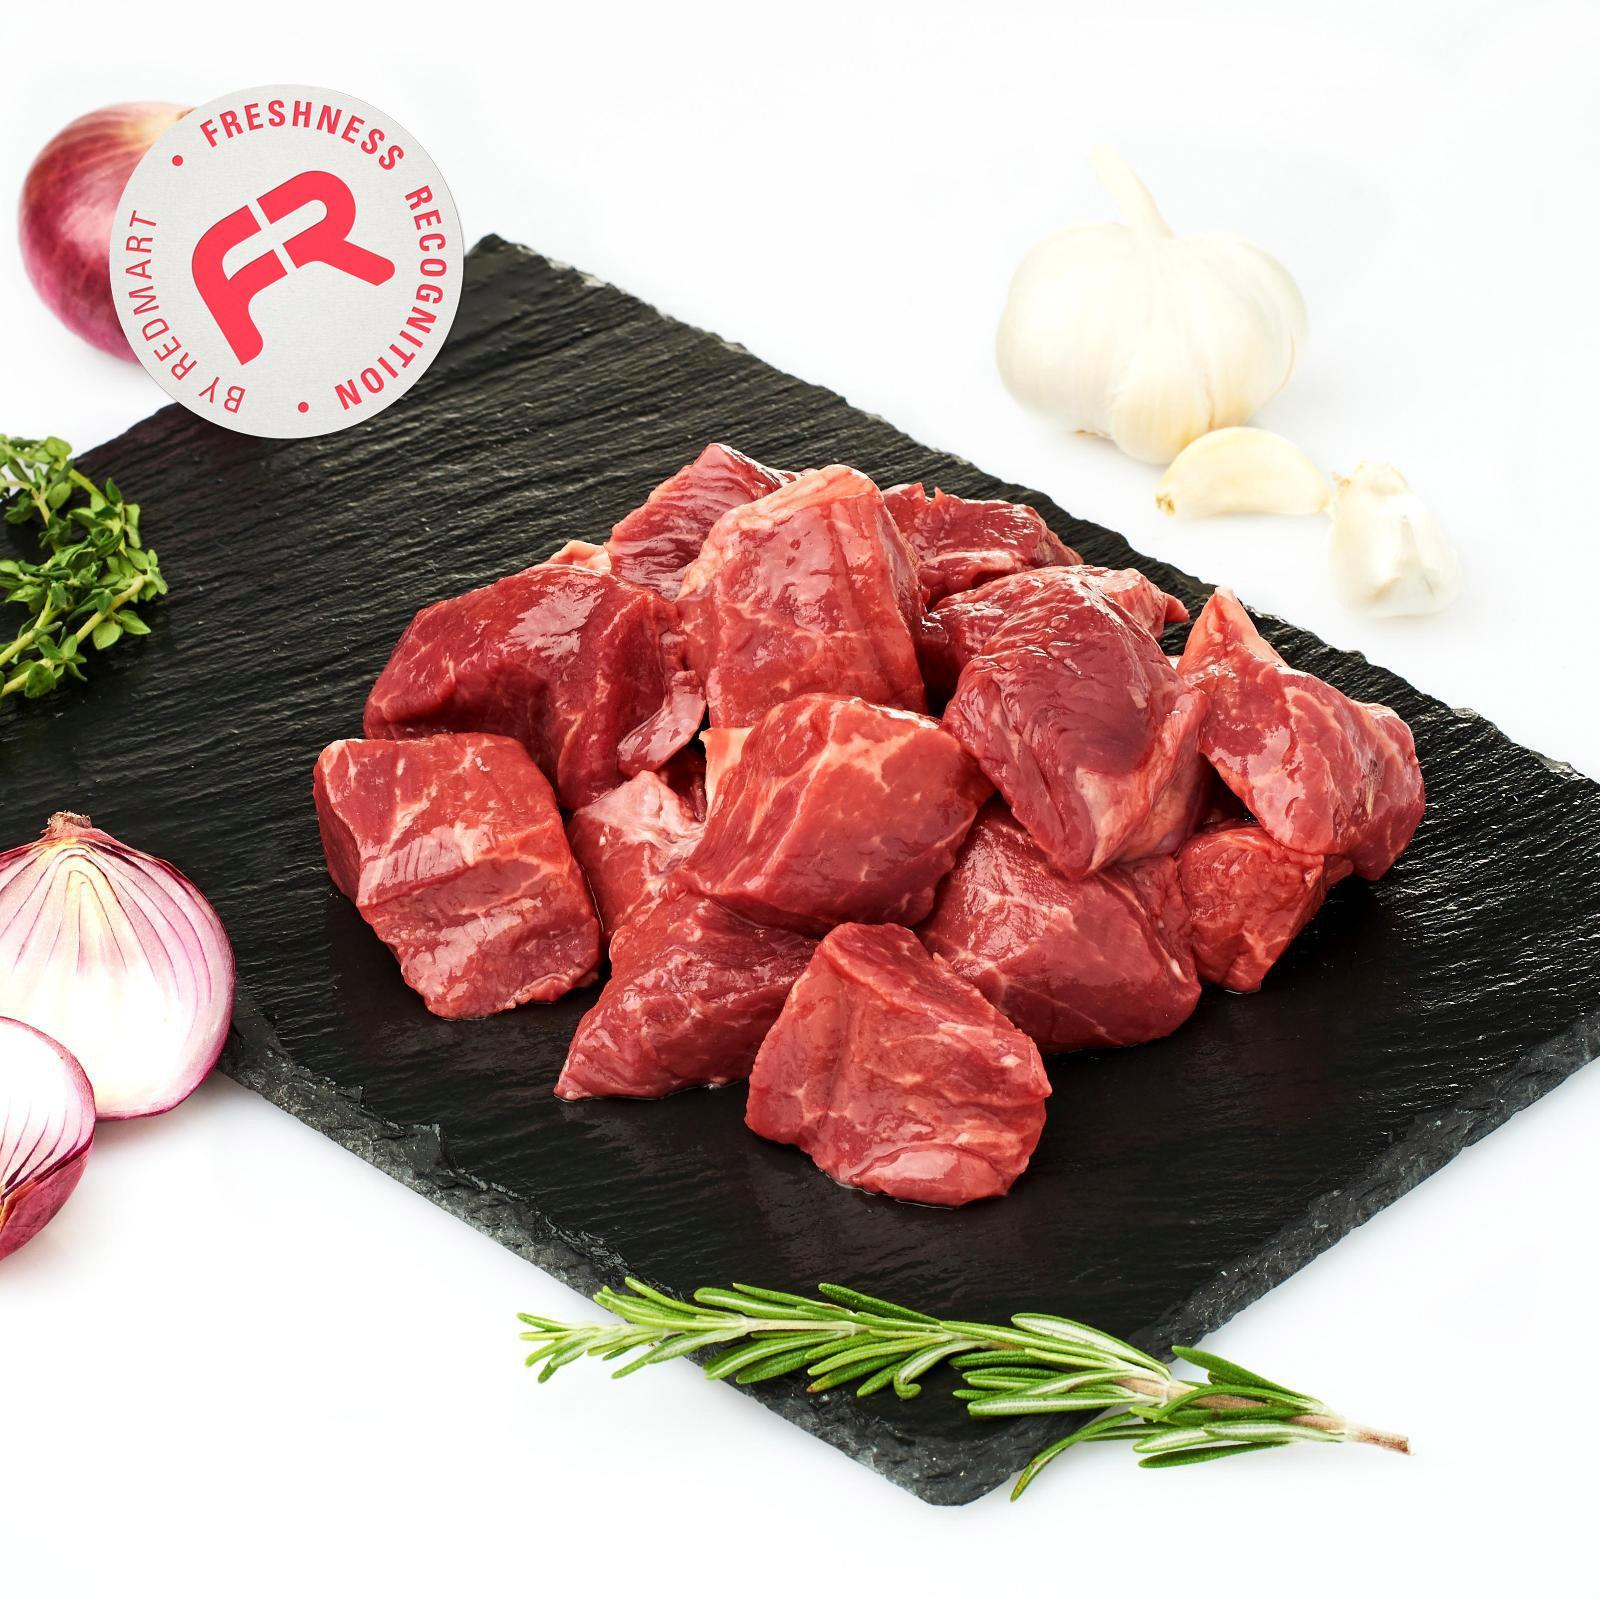 RedMart Grass Fed Angus Diced Beef - Australia